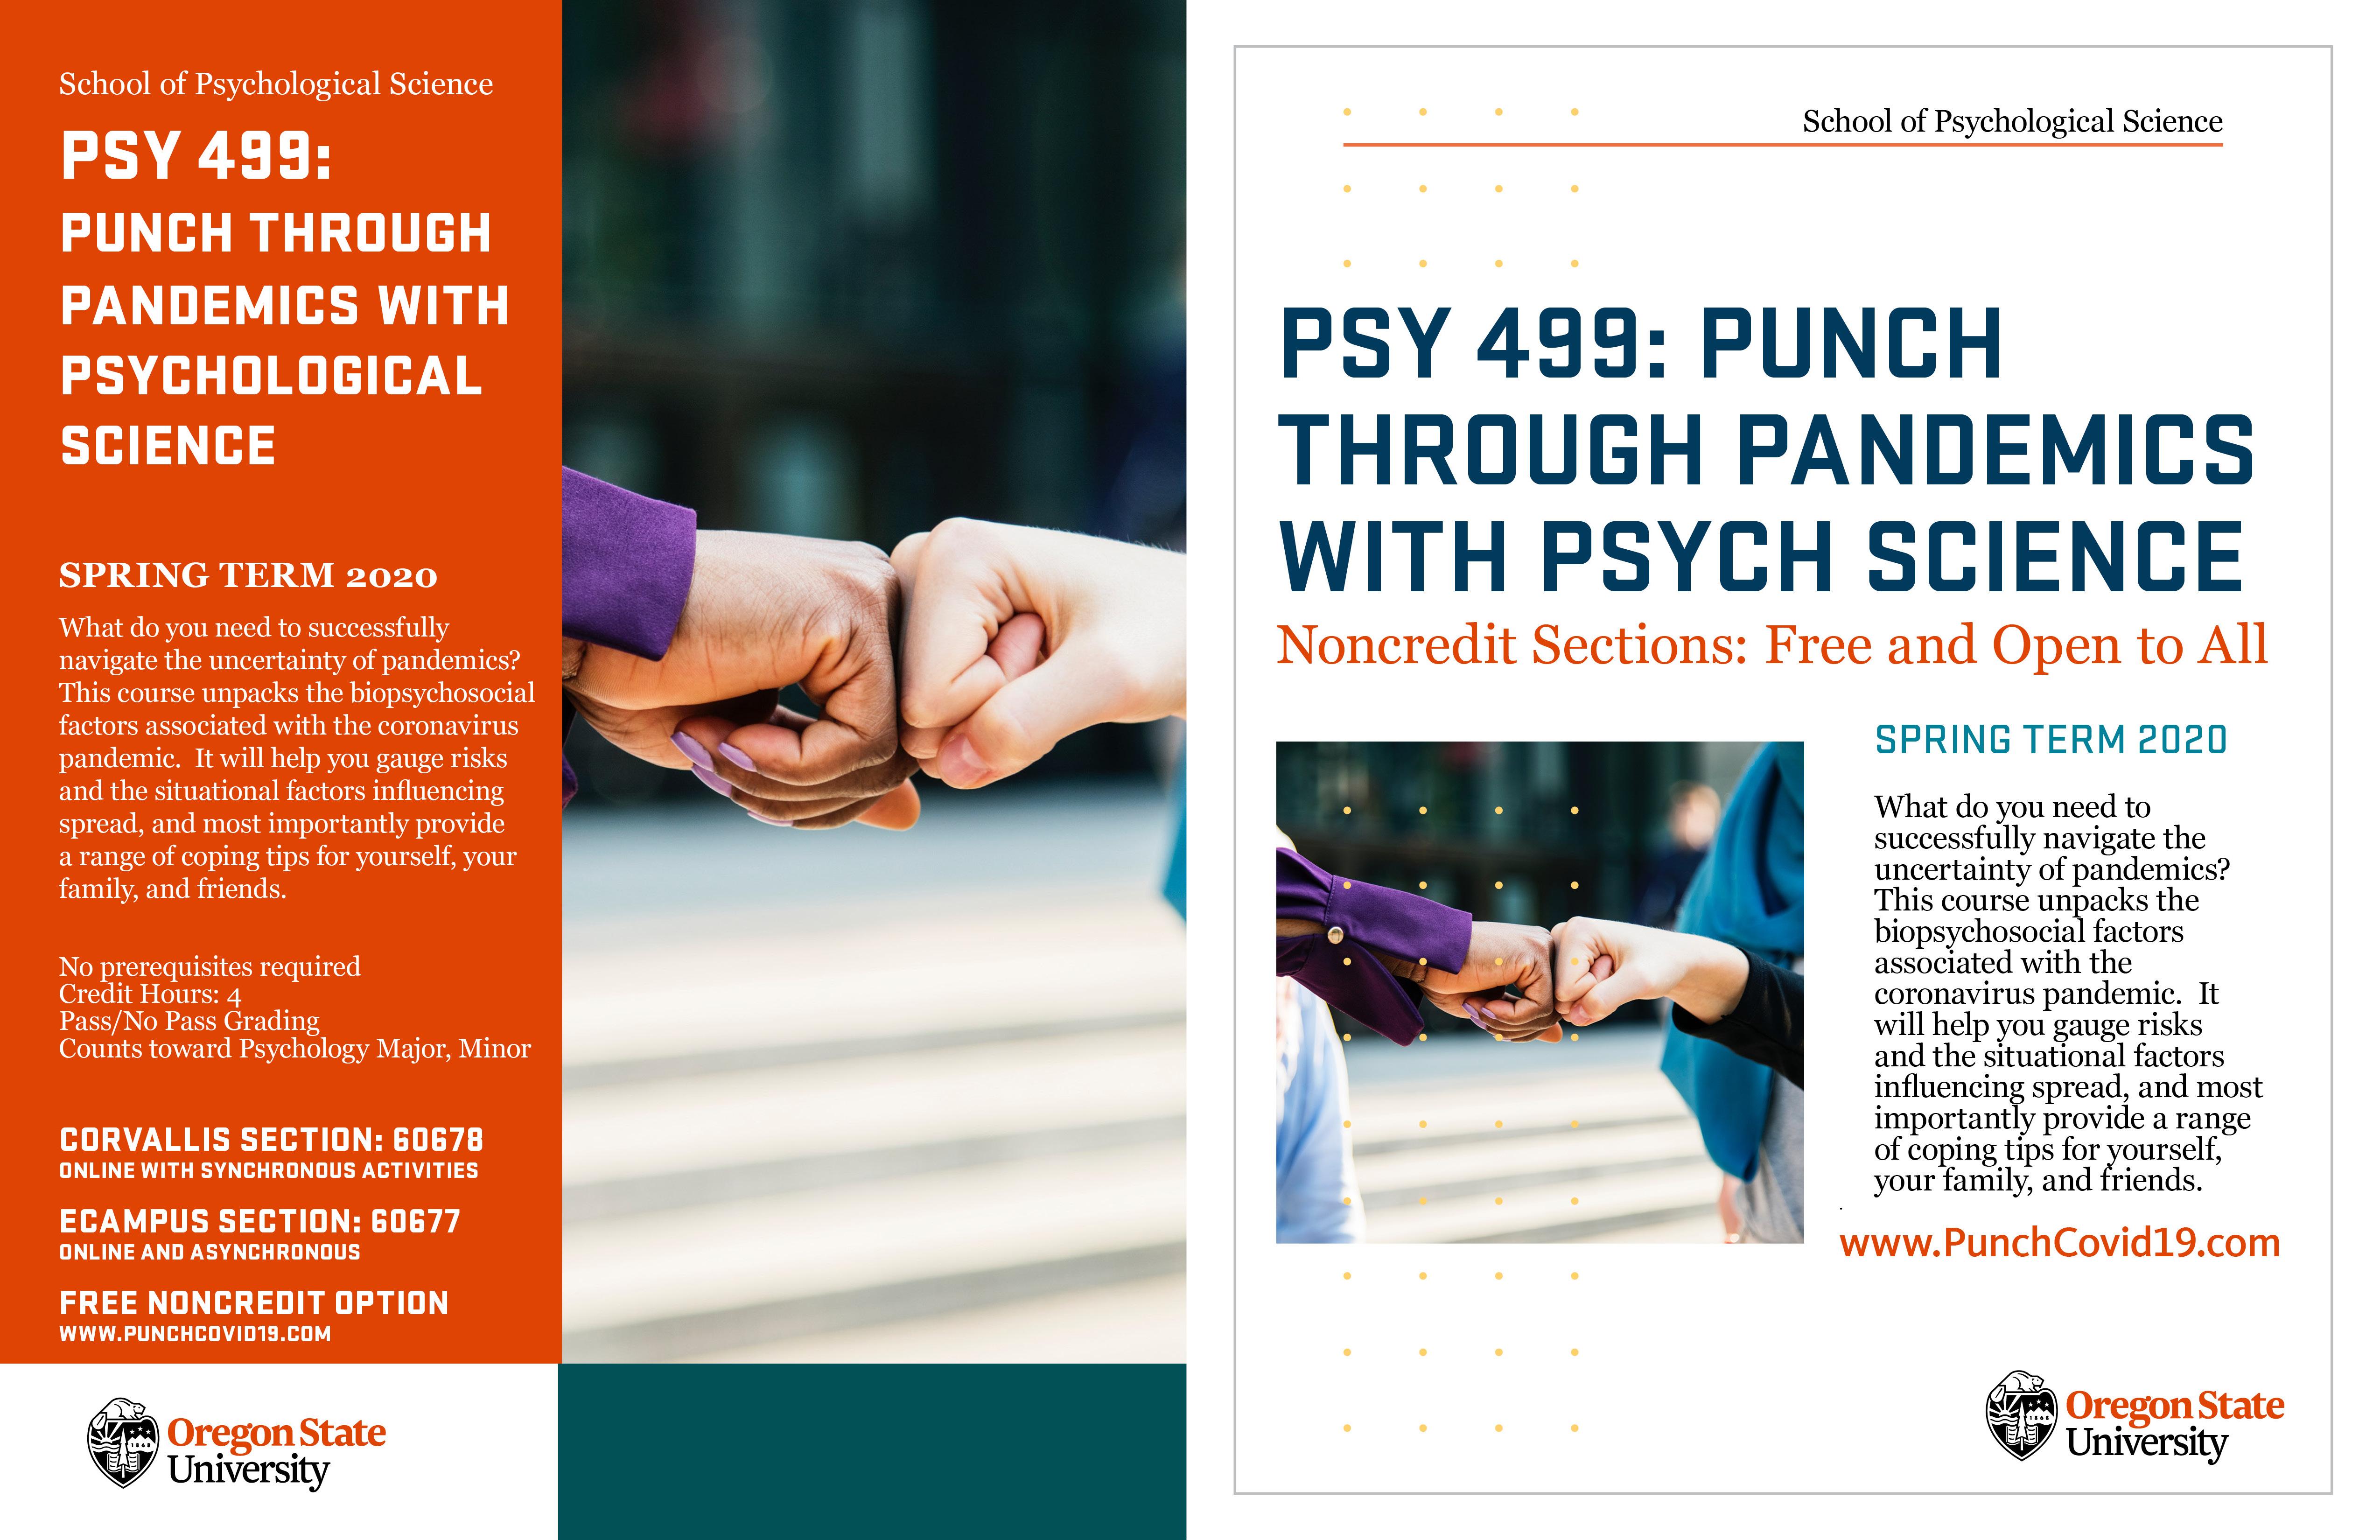 PSY 499 Punch Thru Pandemics Flyer